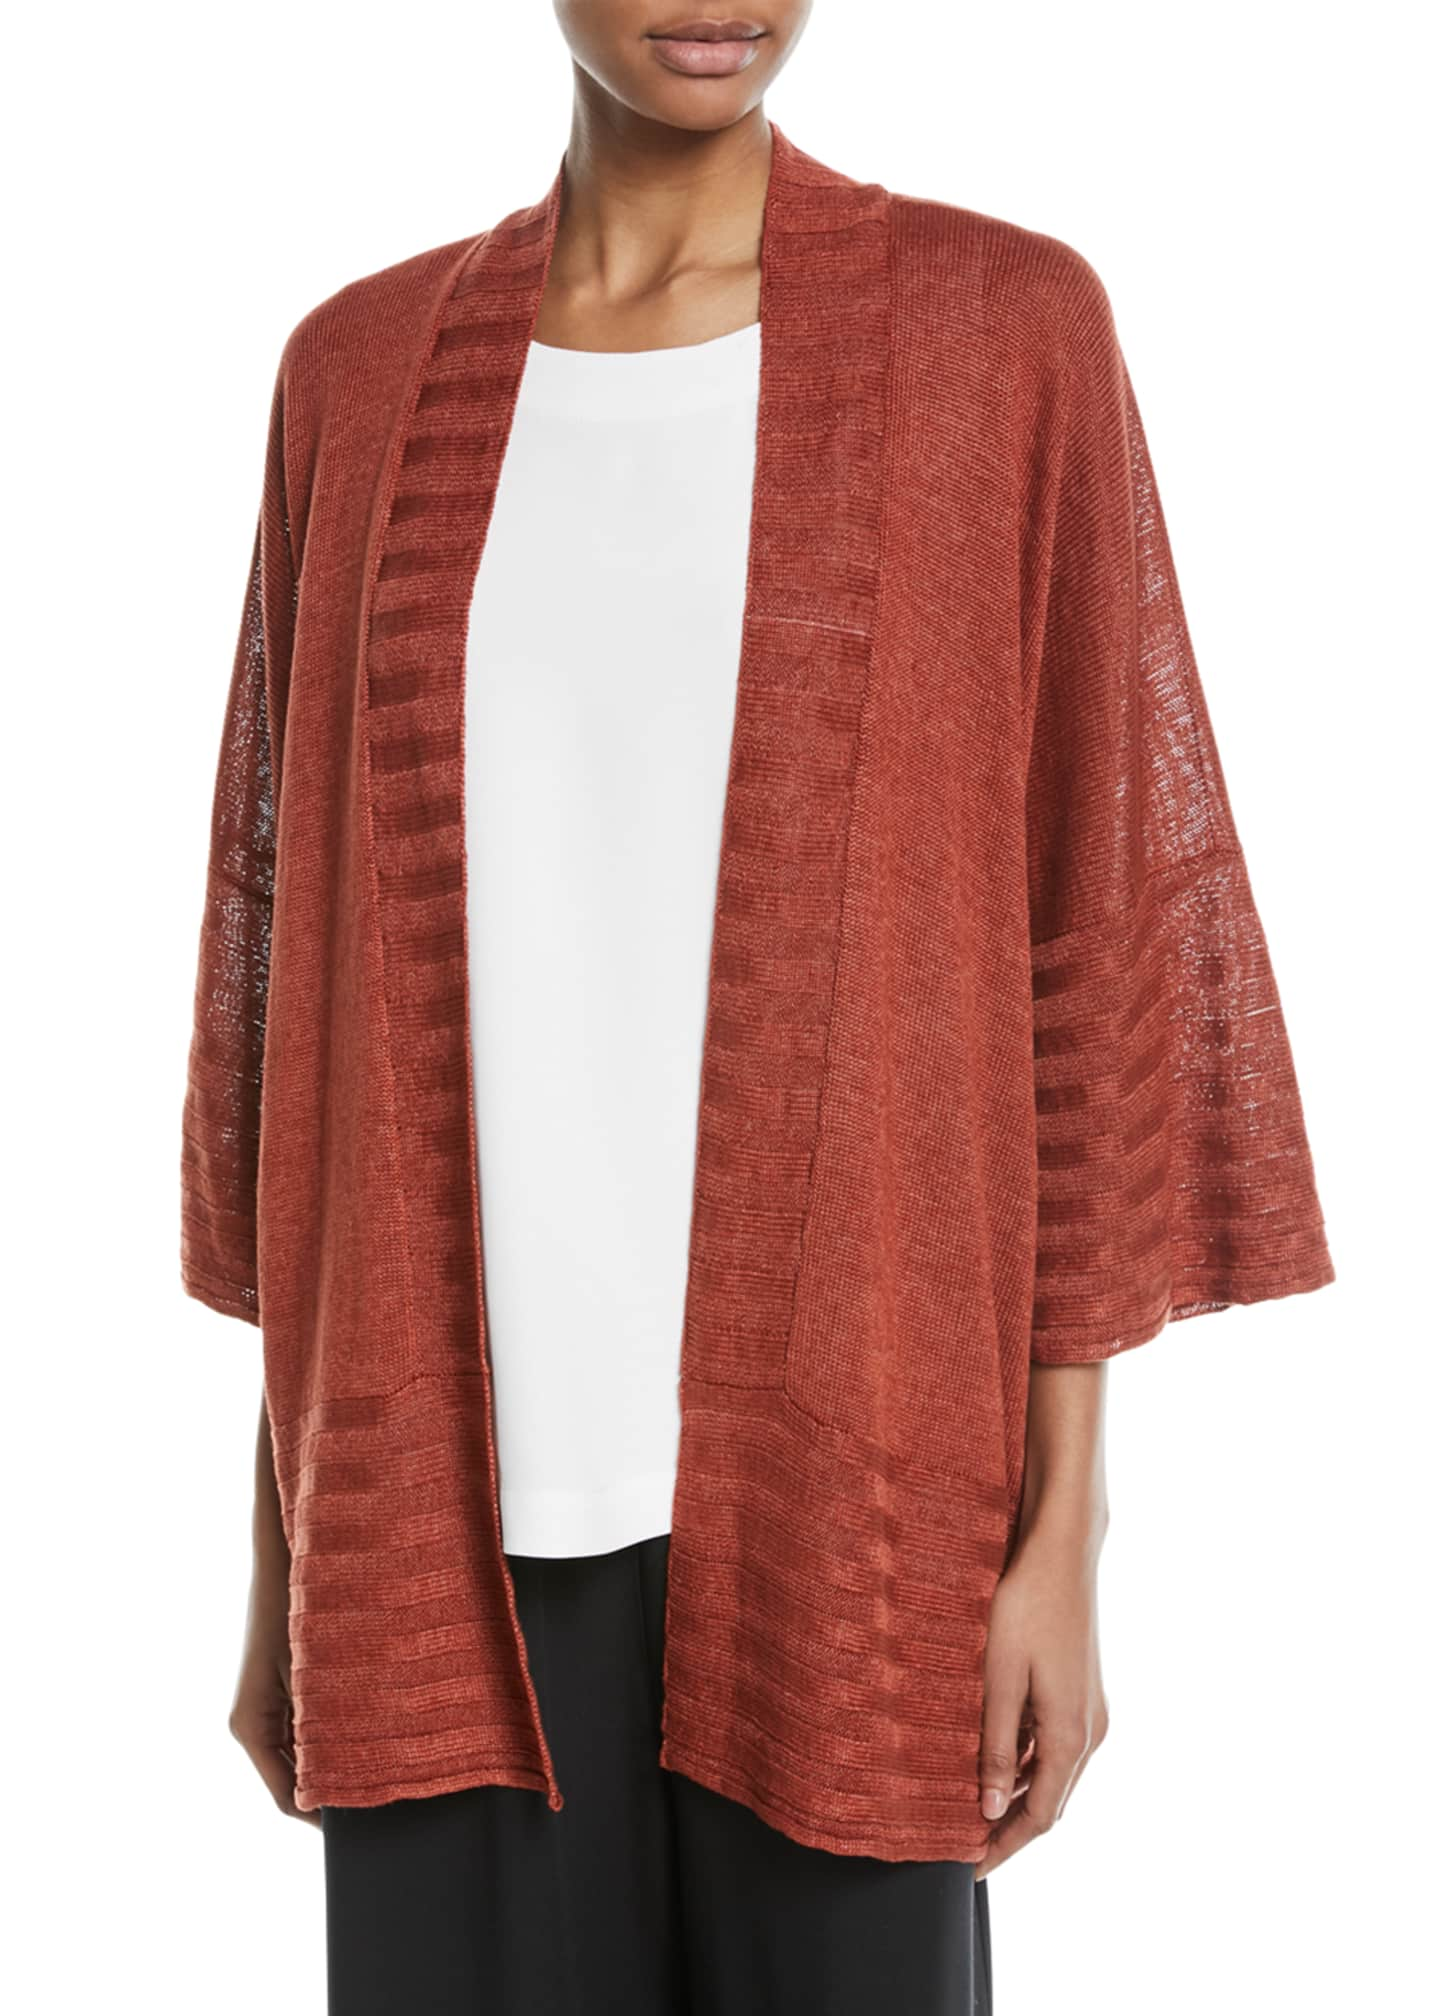 Eskandar Hand-Loomed Knitted Lightweight Linen Poncho Cardigan